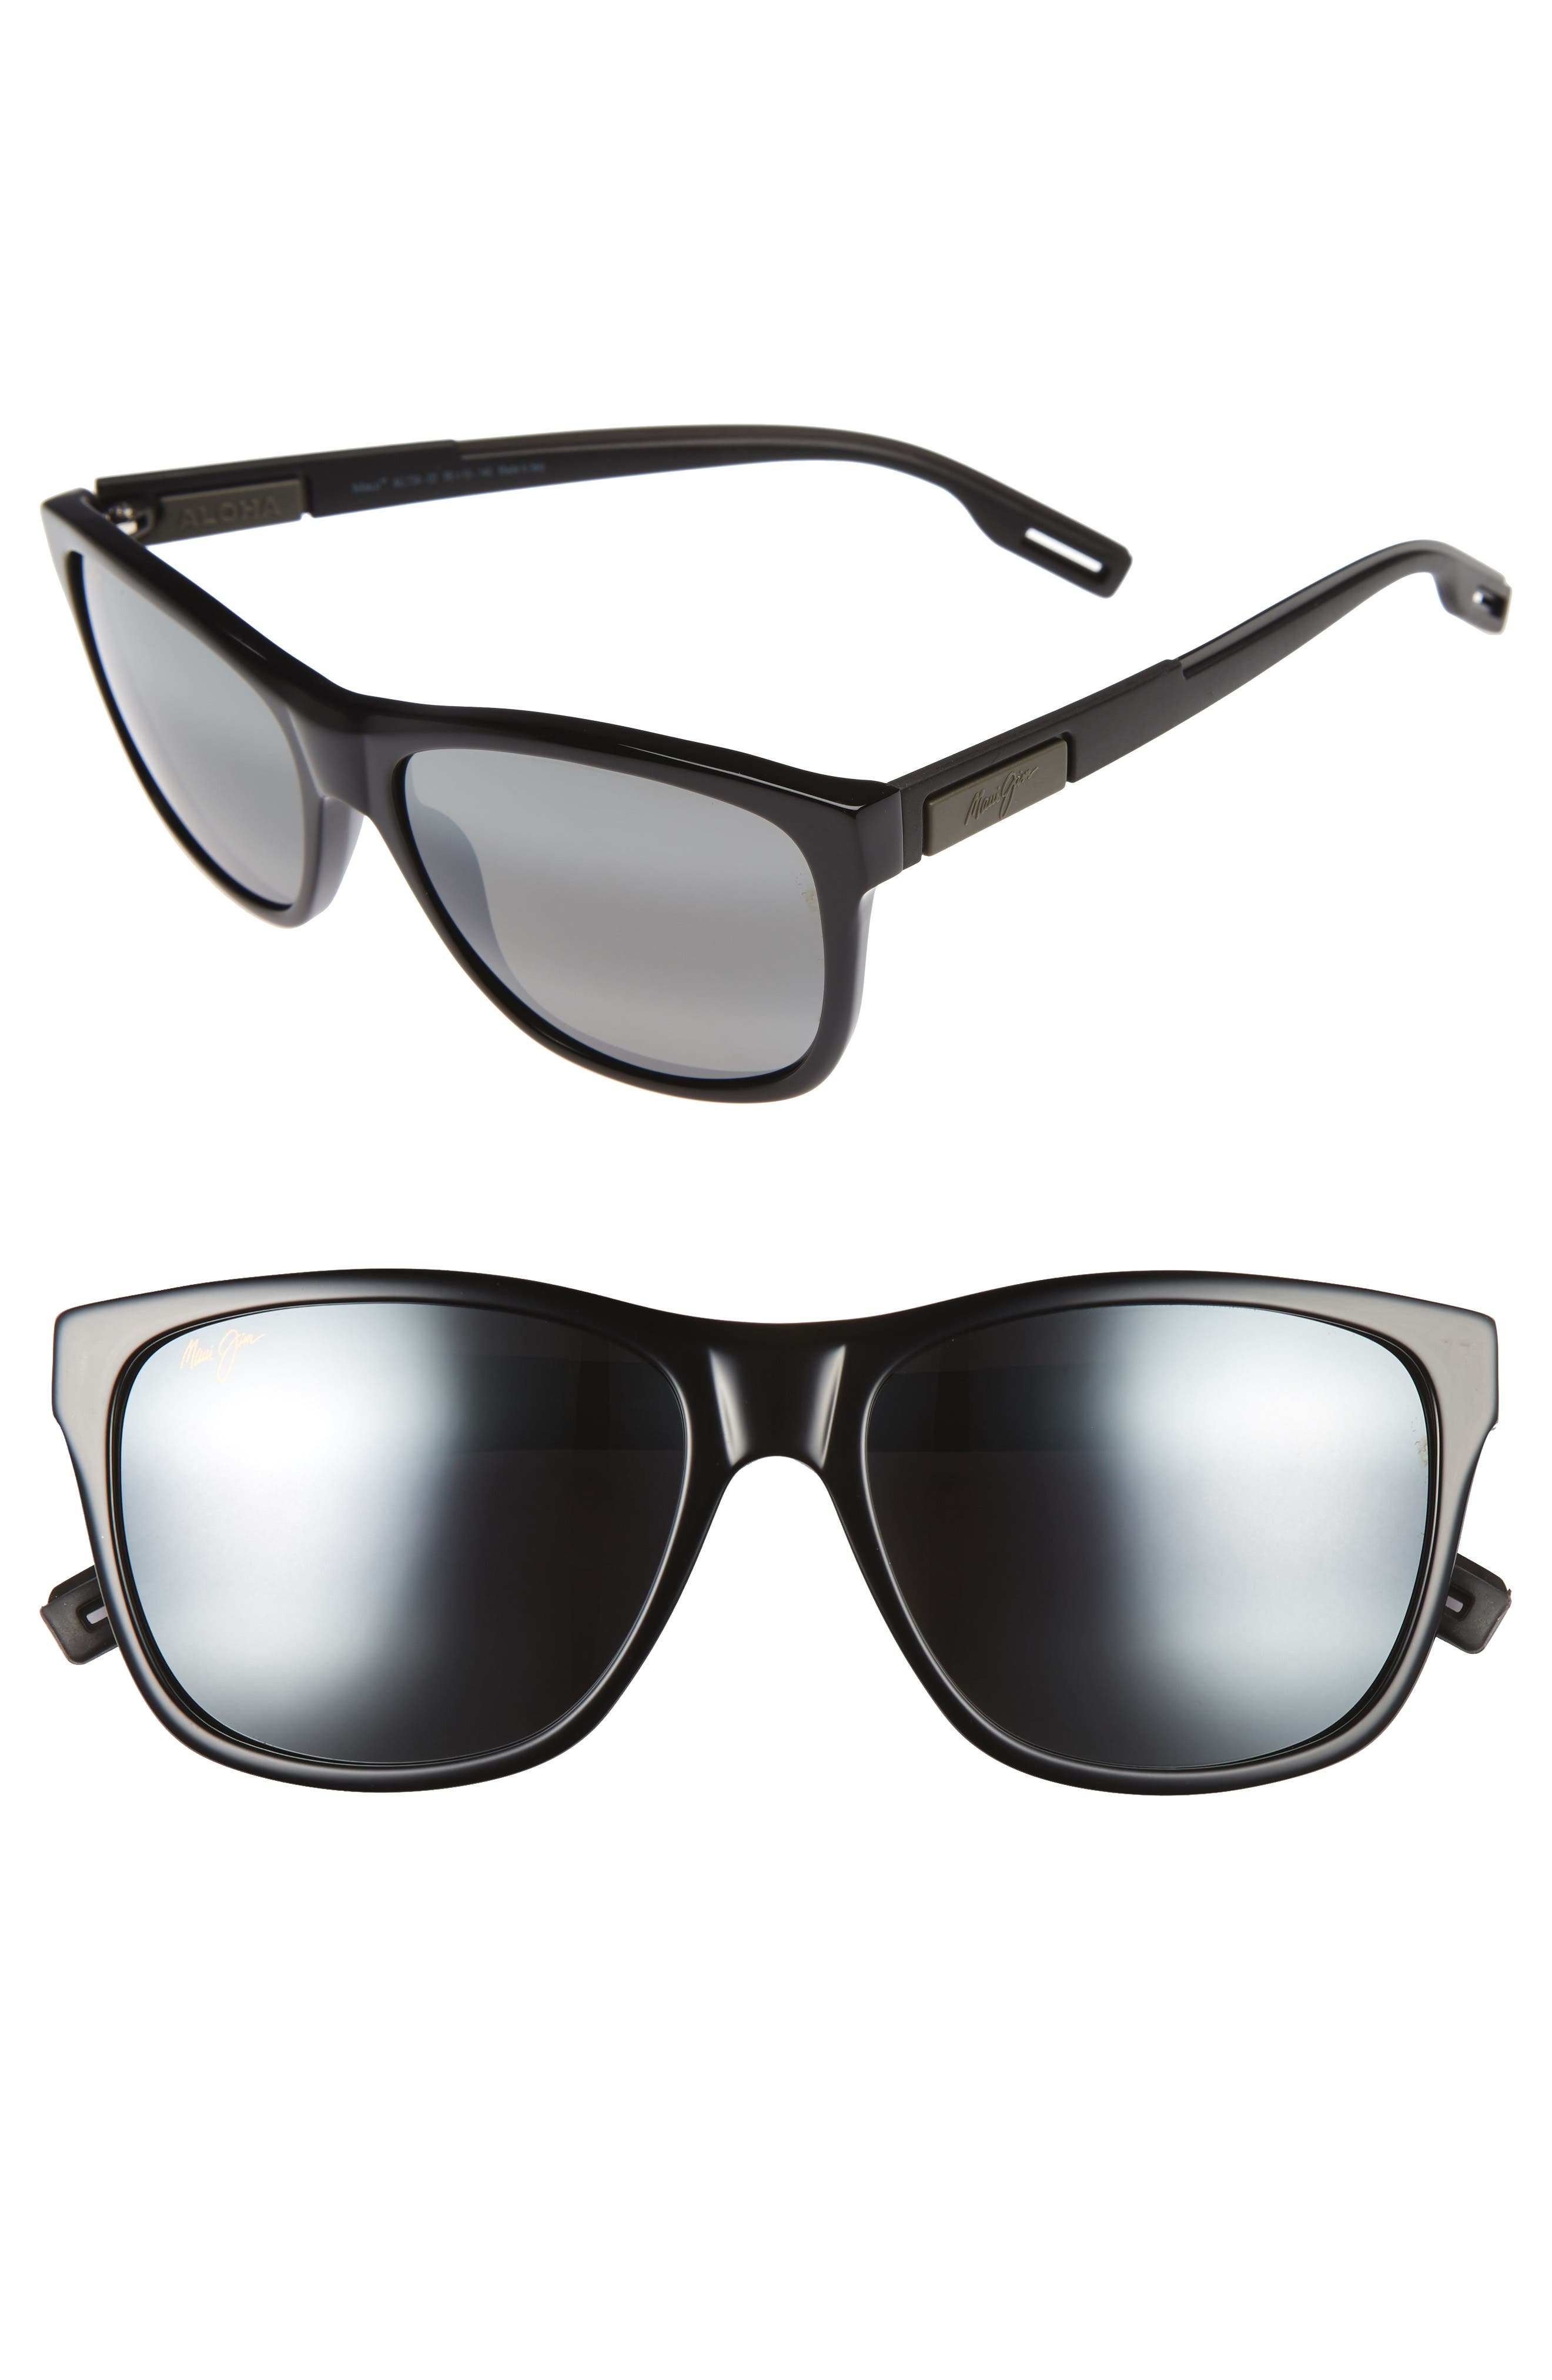 Maui Jim Howzit 5m Polarized Gradient Sunglasses -